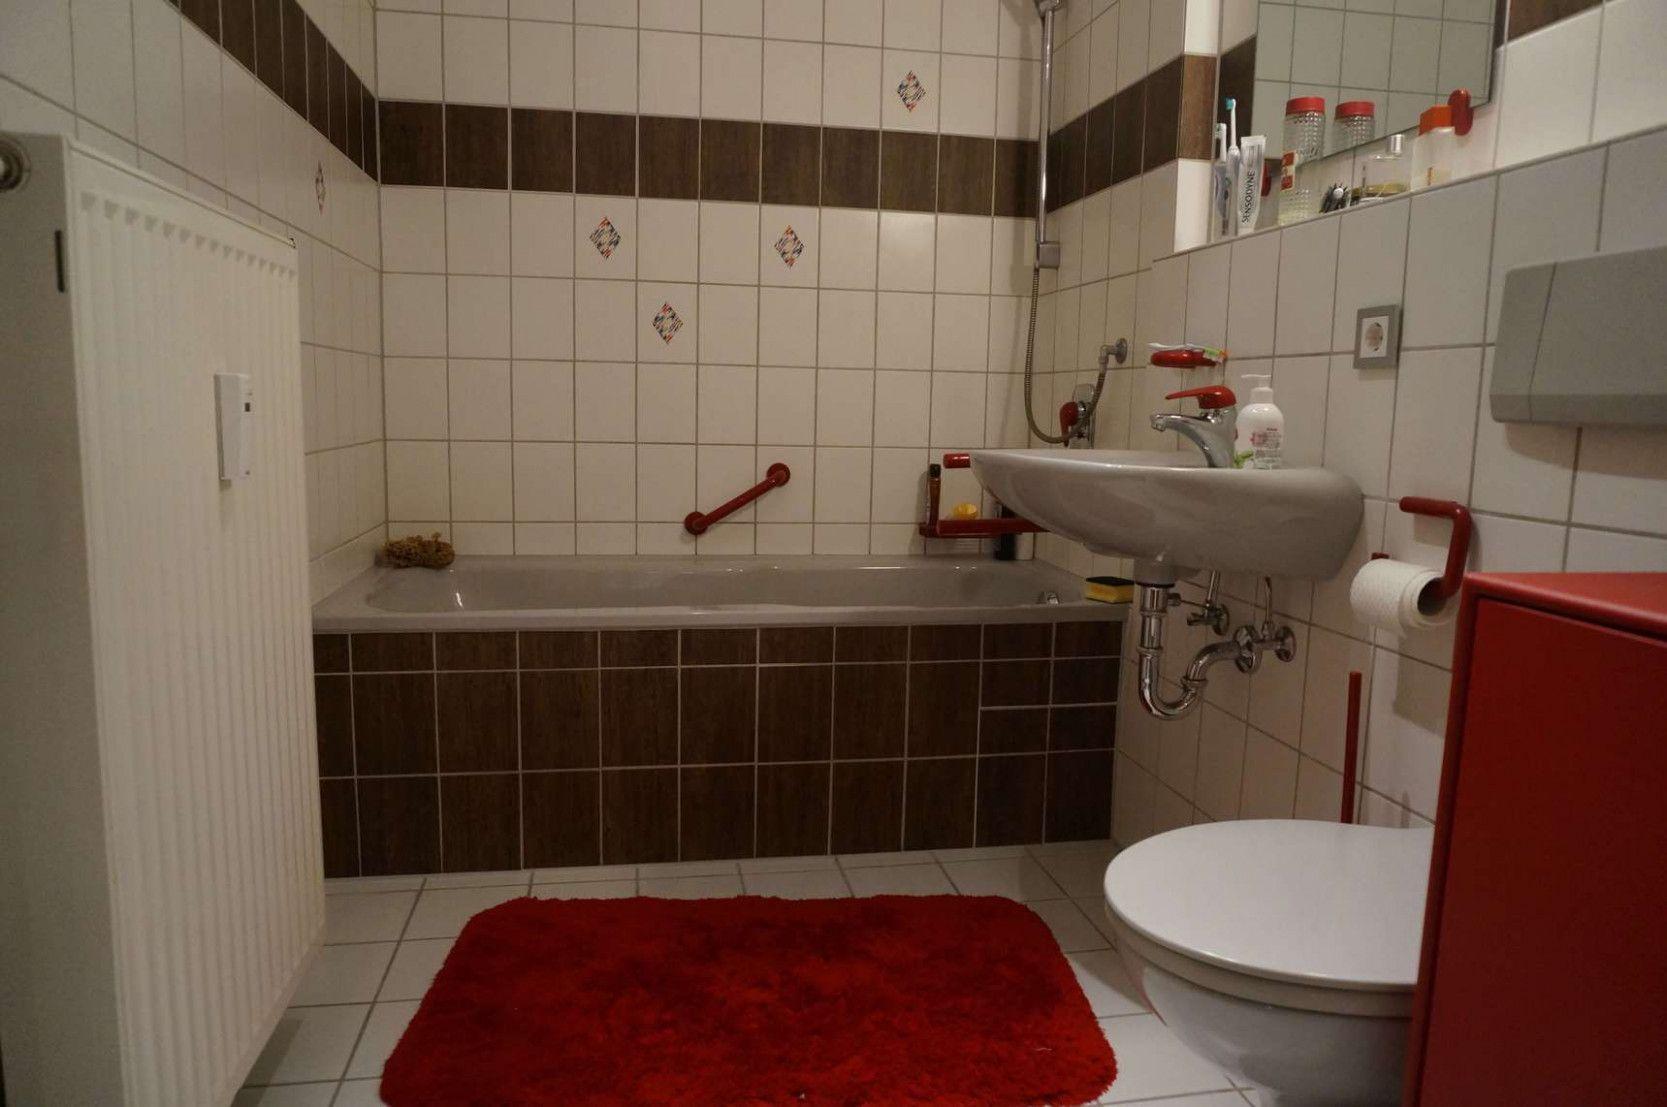 14 Dauer Arbeits Fliesen In 2020 Badezimmer Fliesen Badezimmer Bad Fliesen Ideen